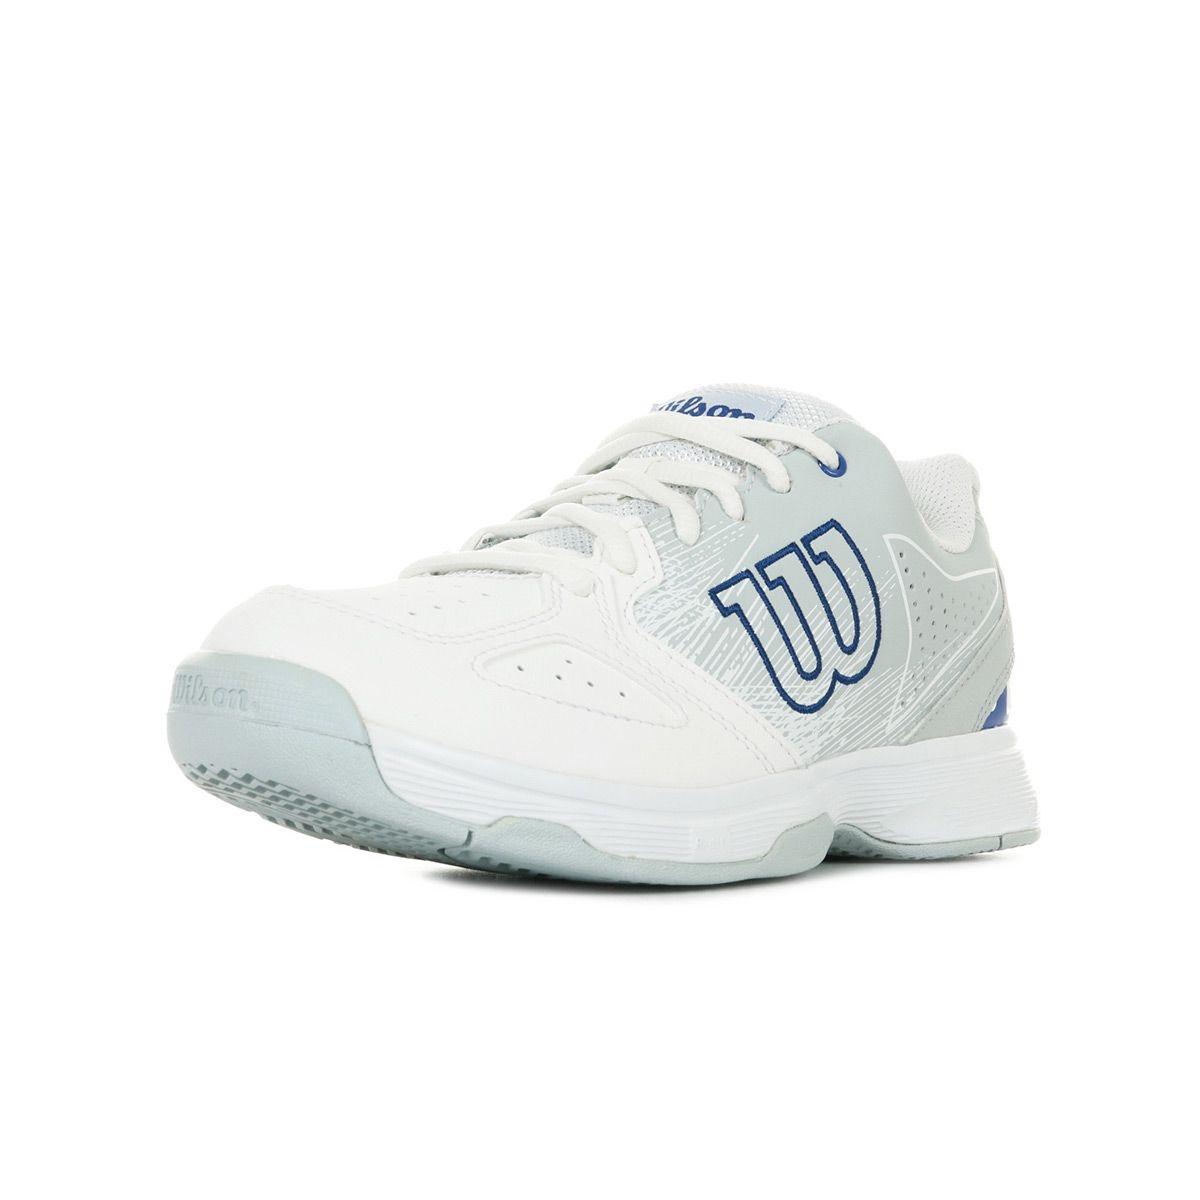 Chaussures de tennis Stroke JR